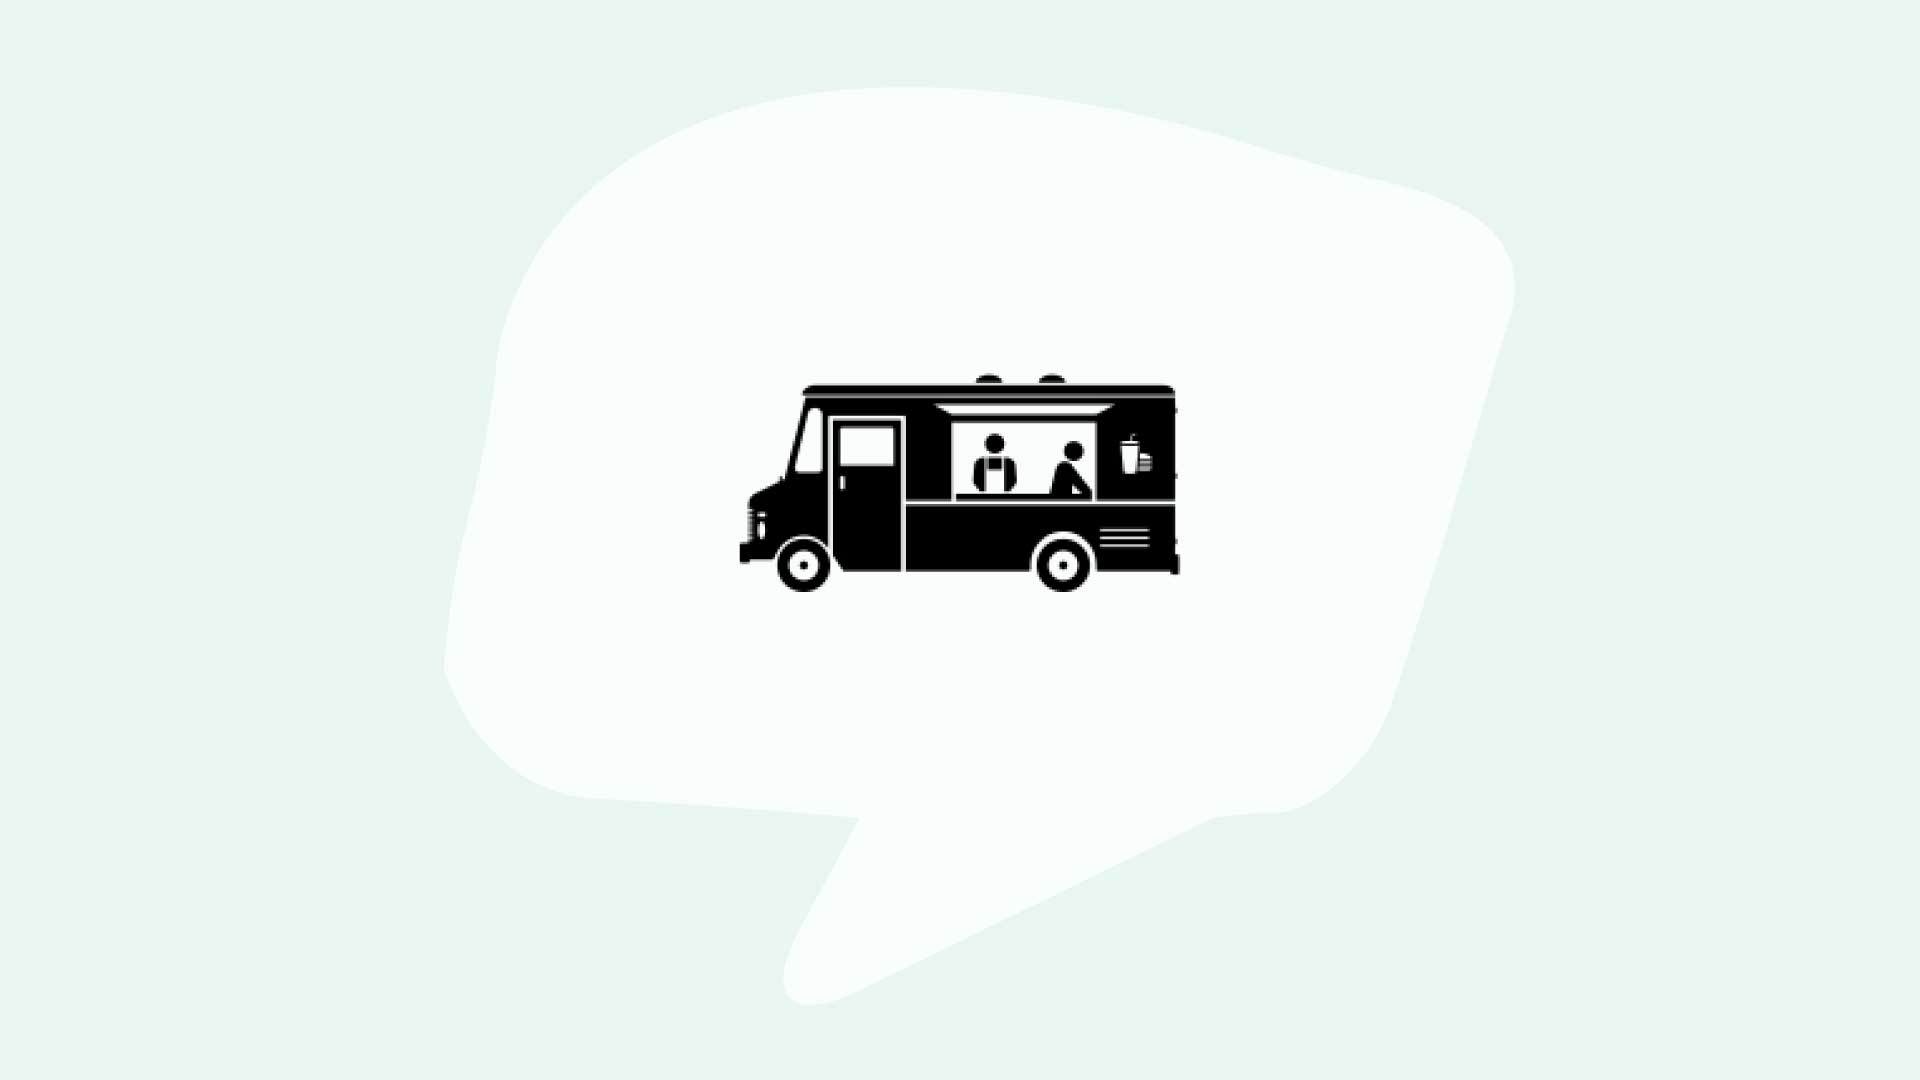 truested-food-truck-wom